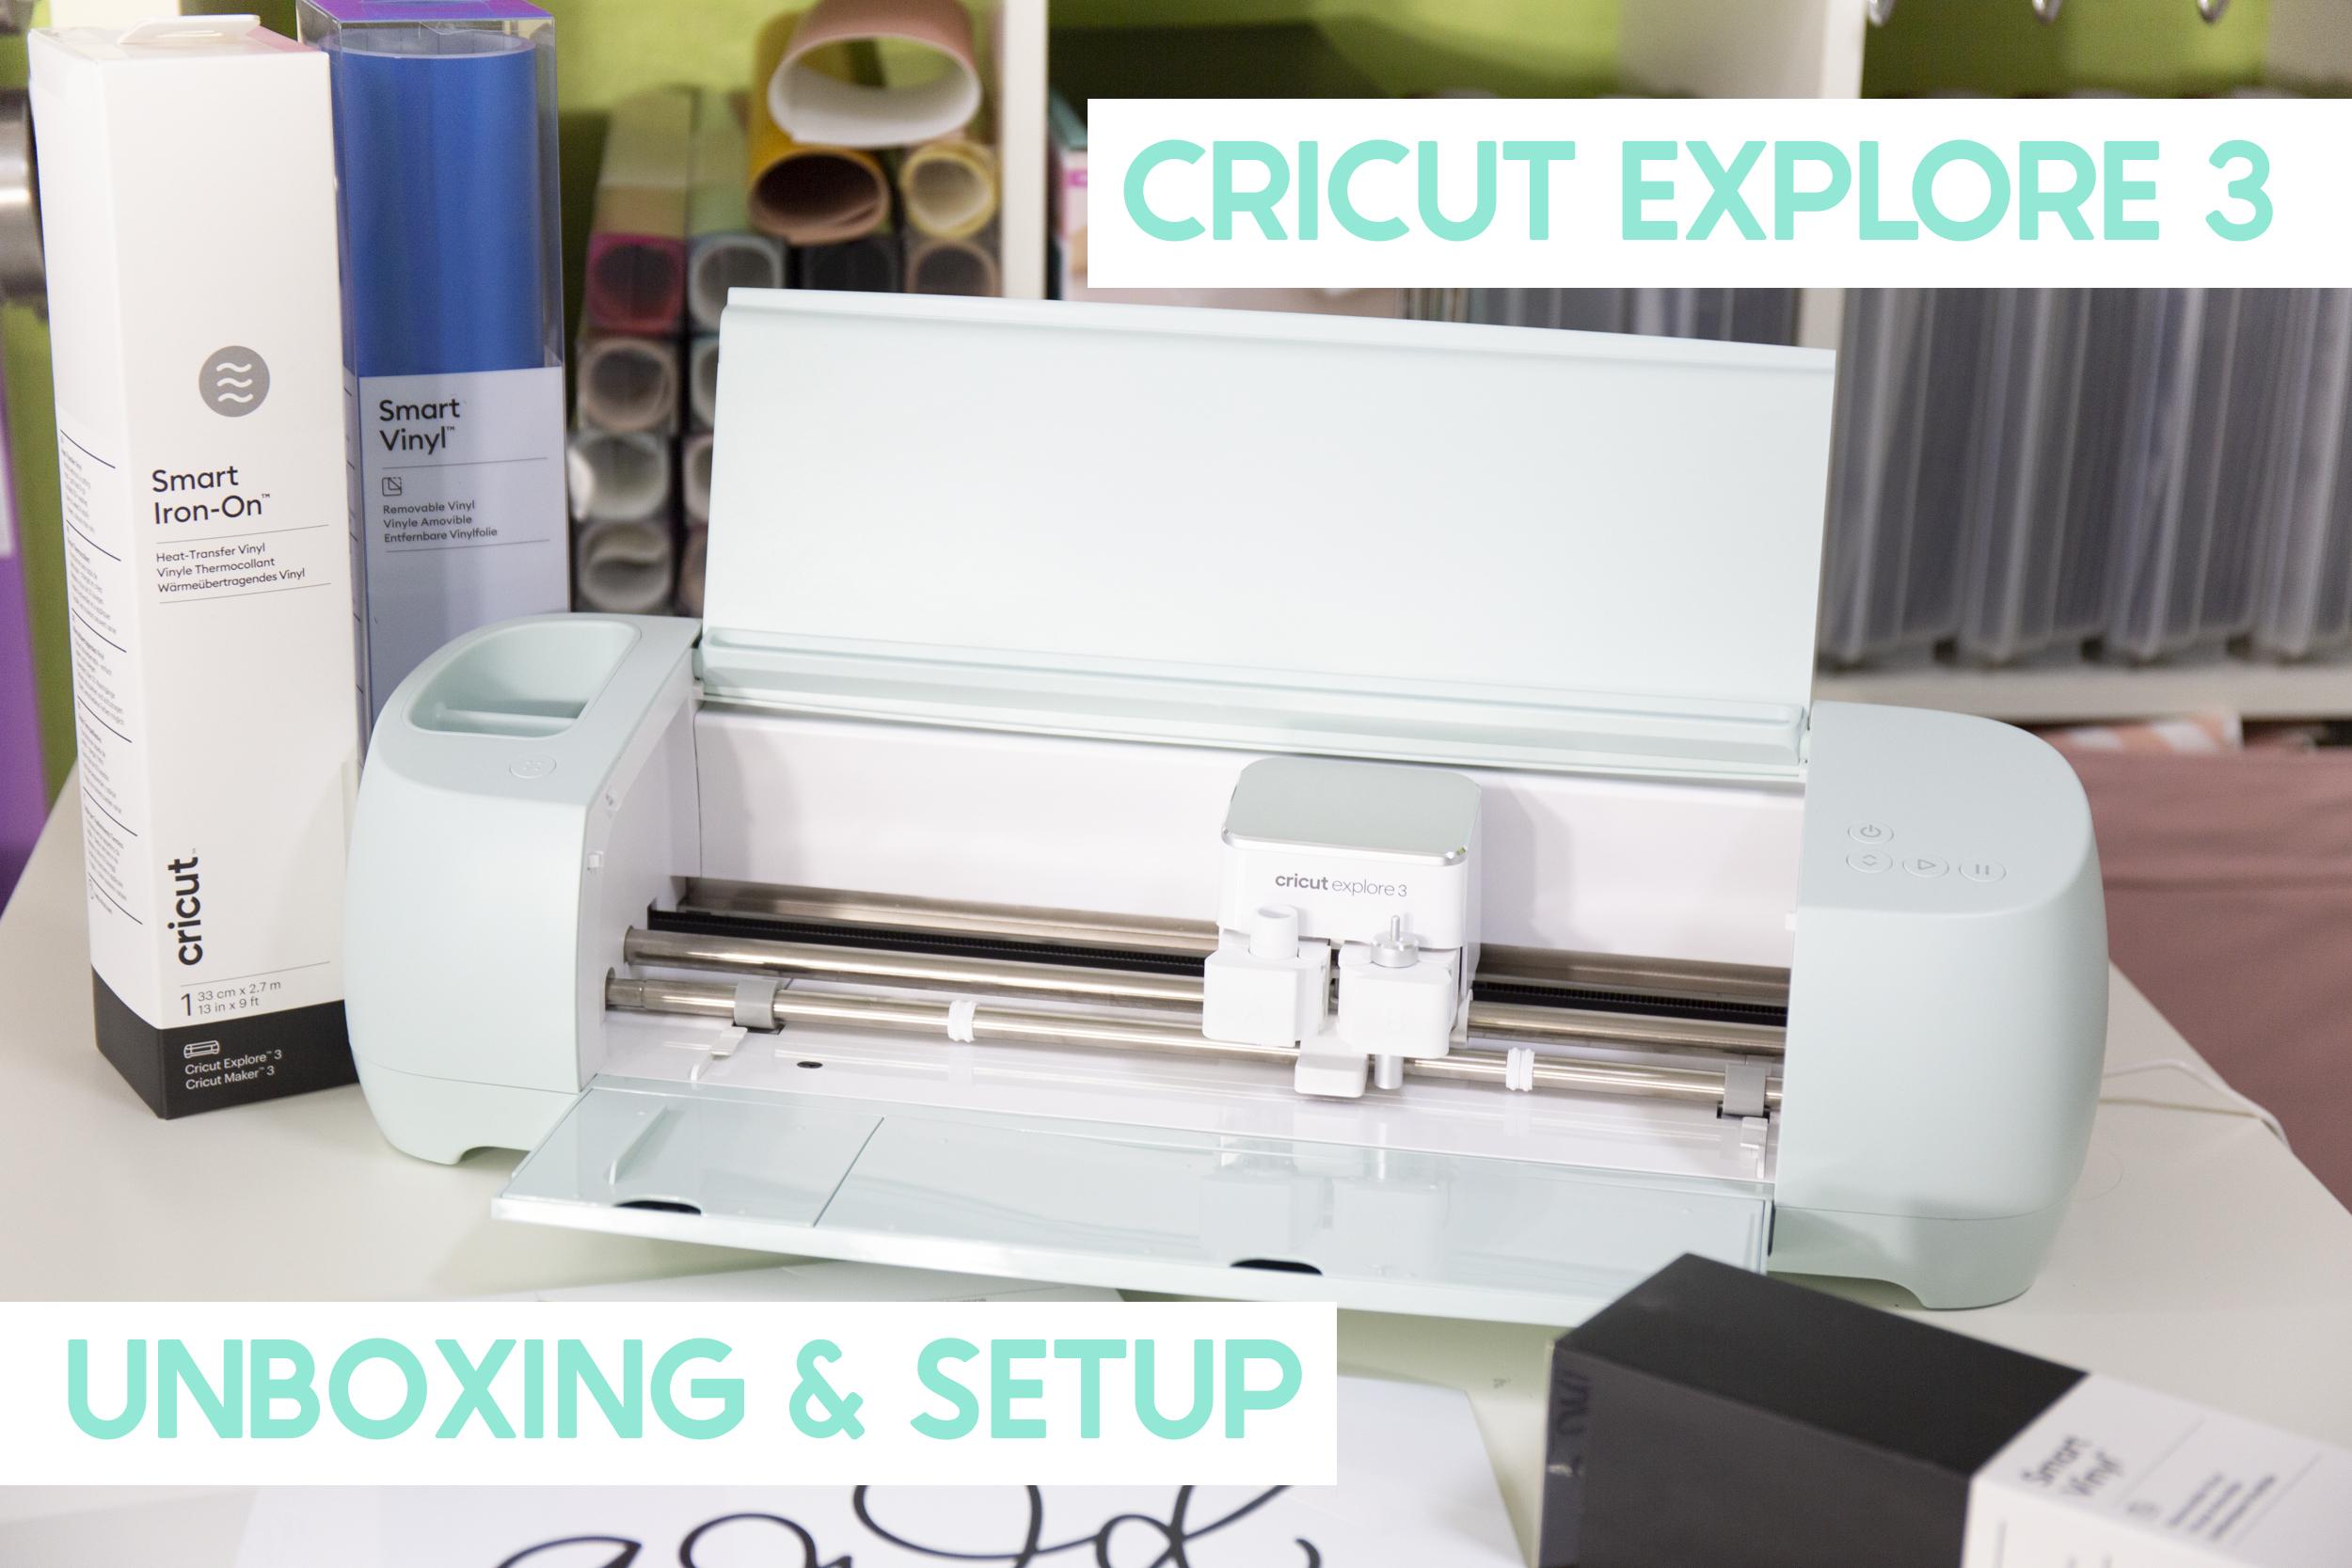 Cricut Explore 3 auf deutsch